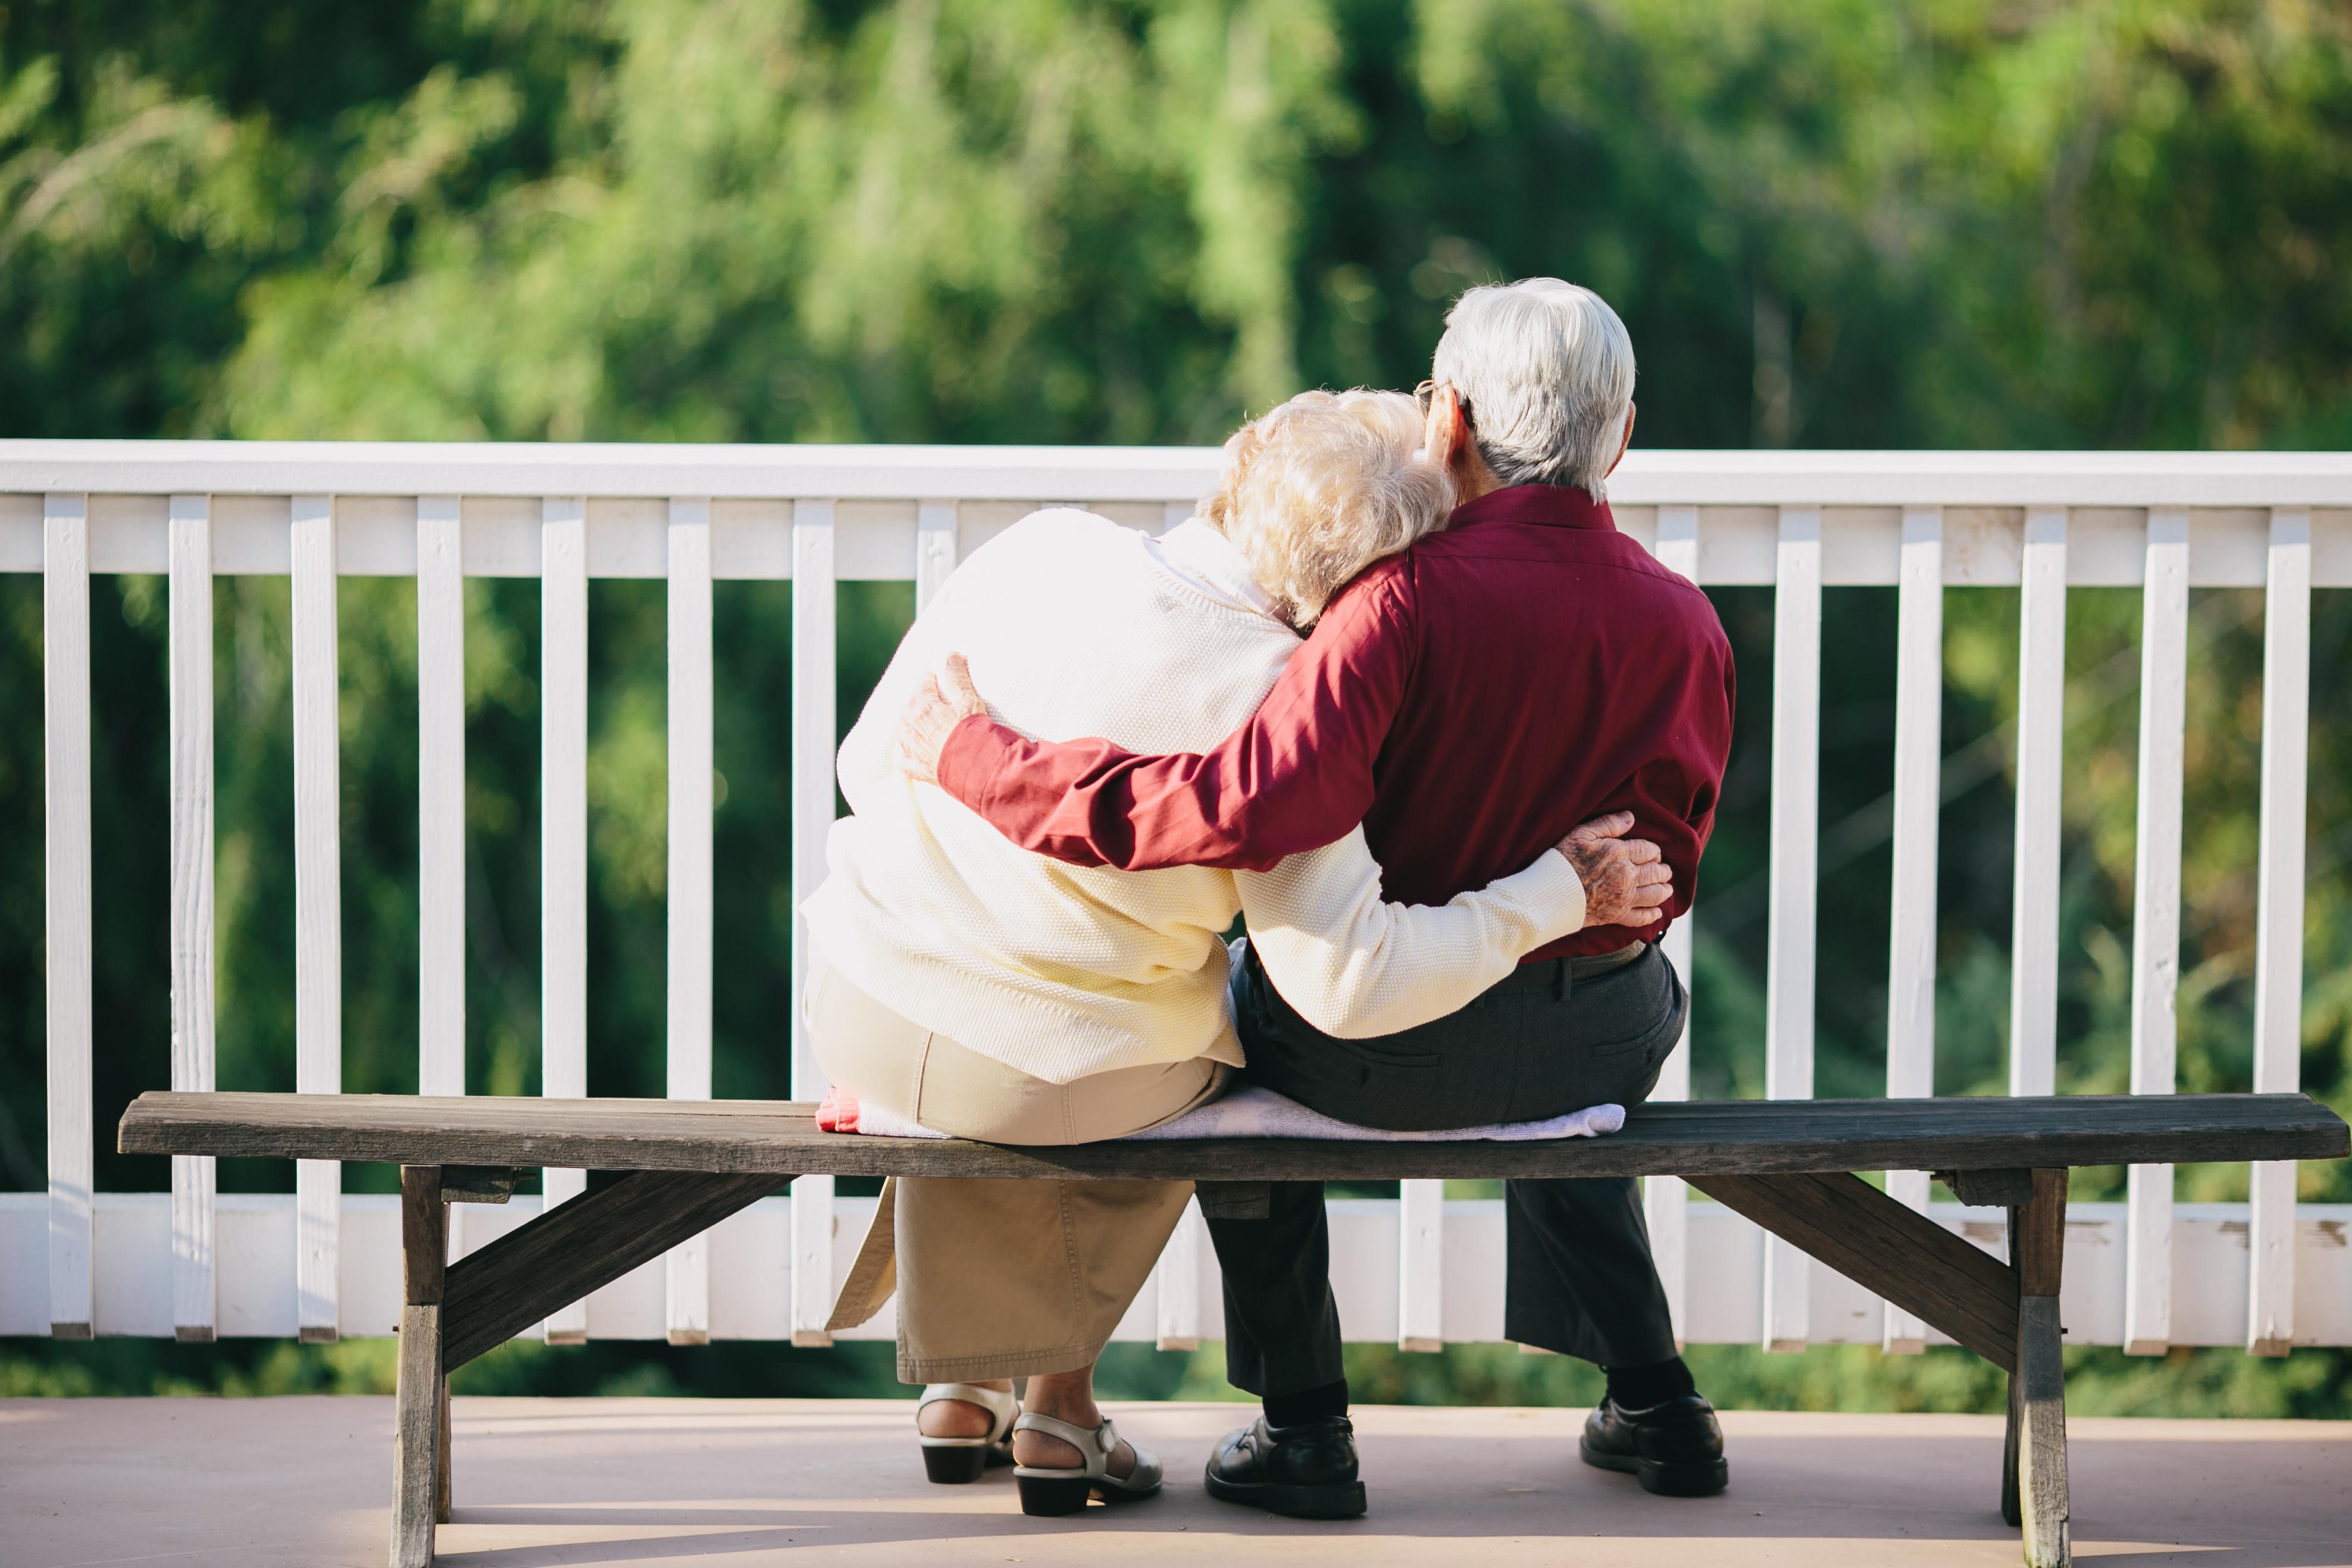 La enfermedad de Alzheimer afecta de manera desproporcionada a la comunidad latina.